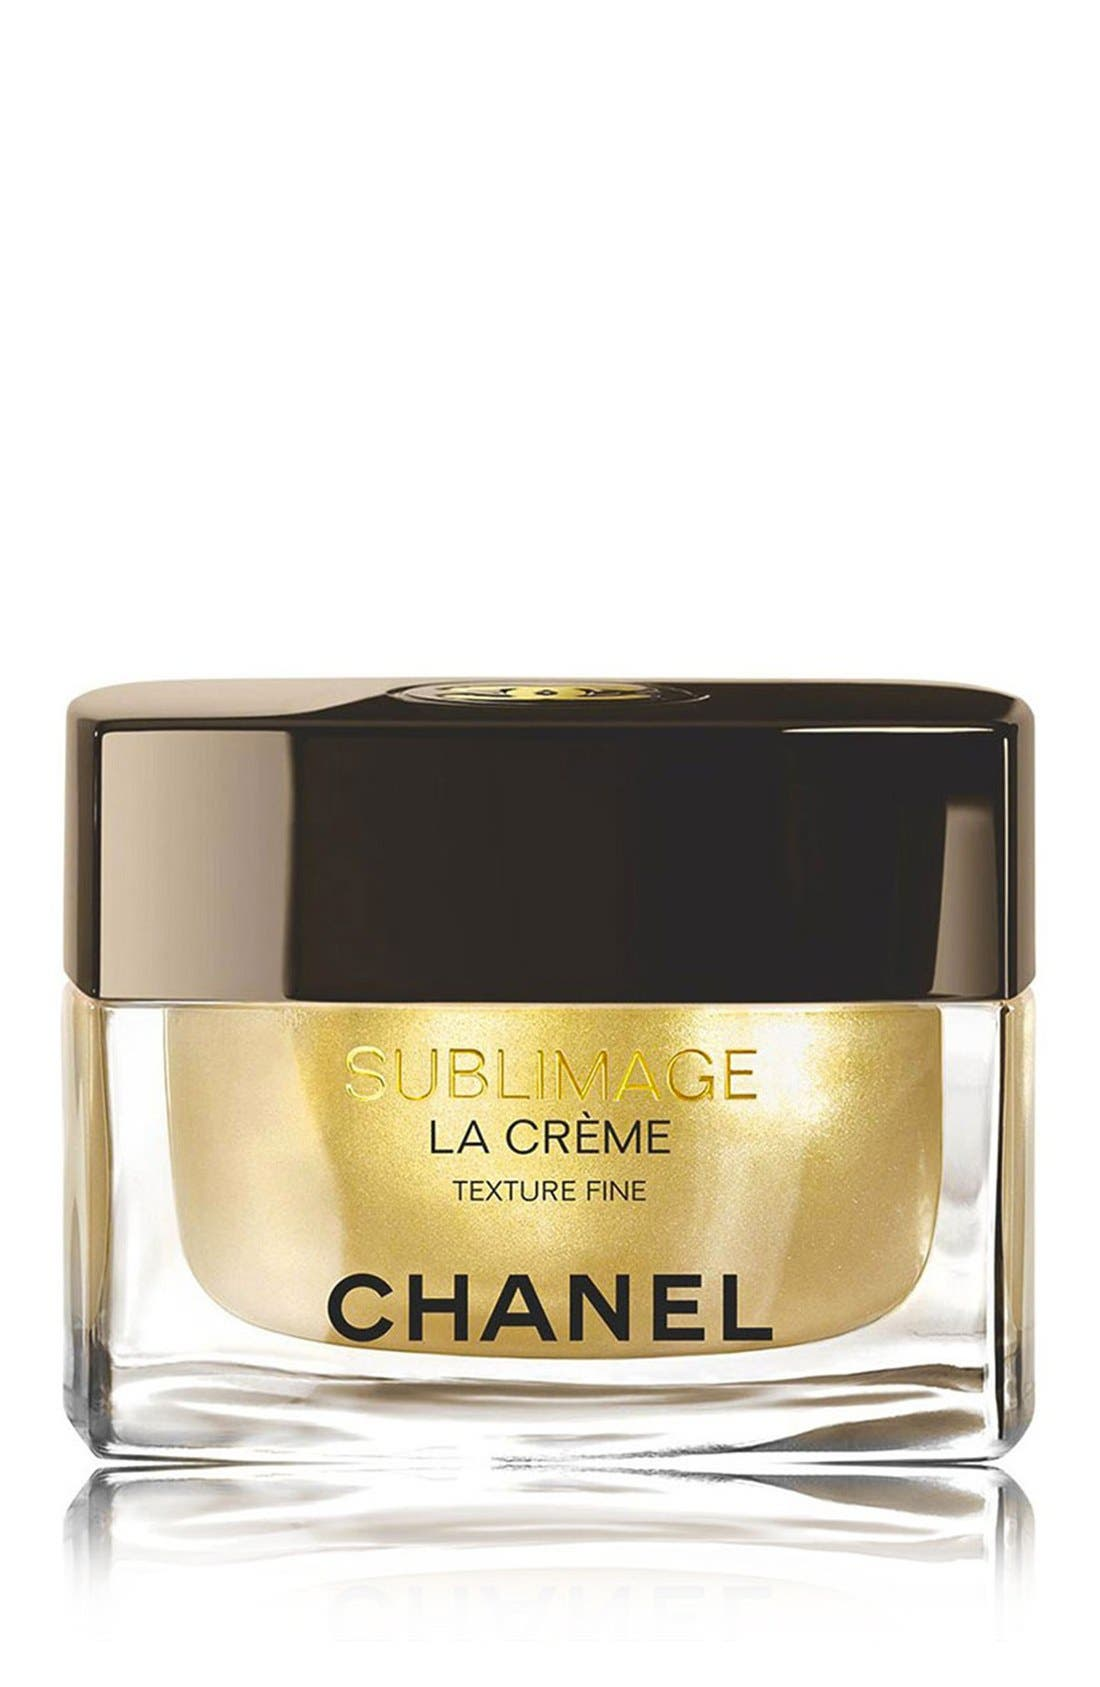 CHANEL SUBLIMAGE LA CRÈME  Ultimate Skin Regeneration Texture Fine | Nordstrom